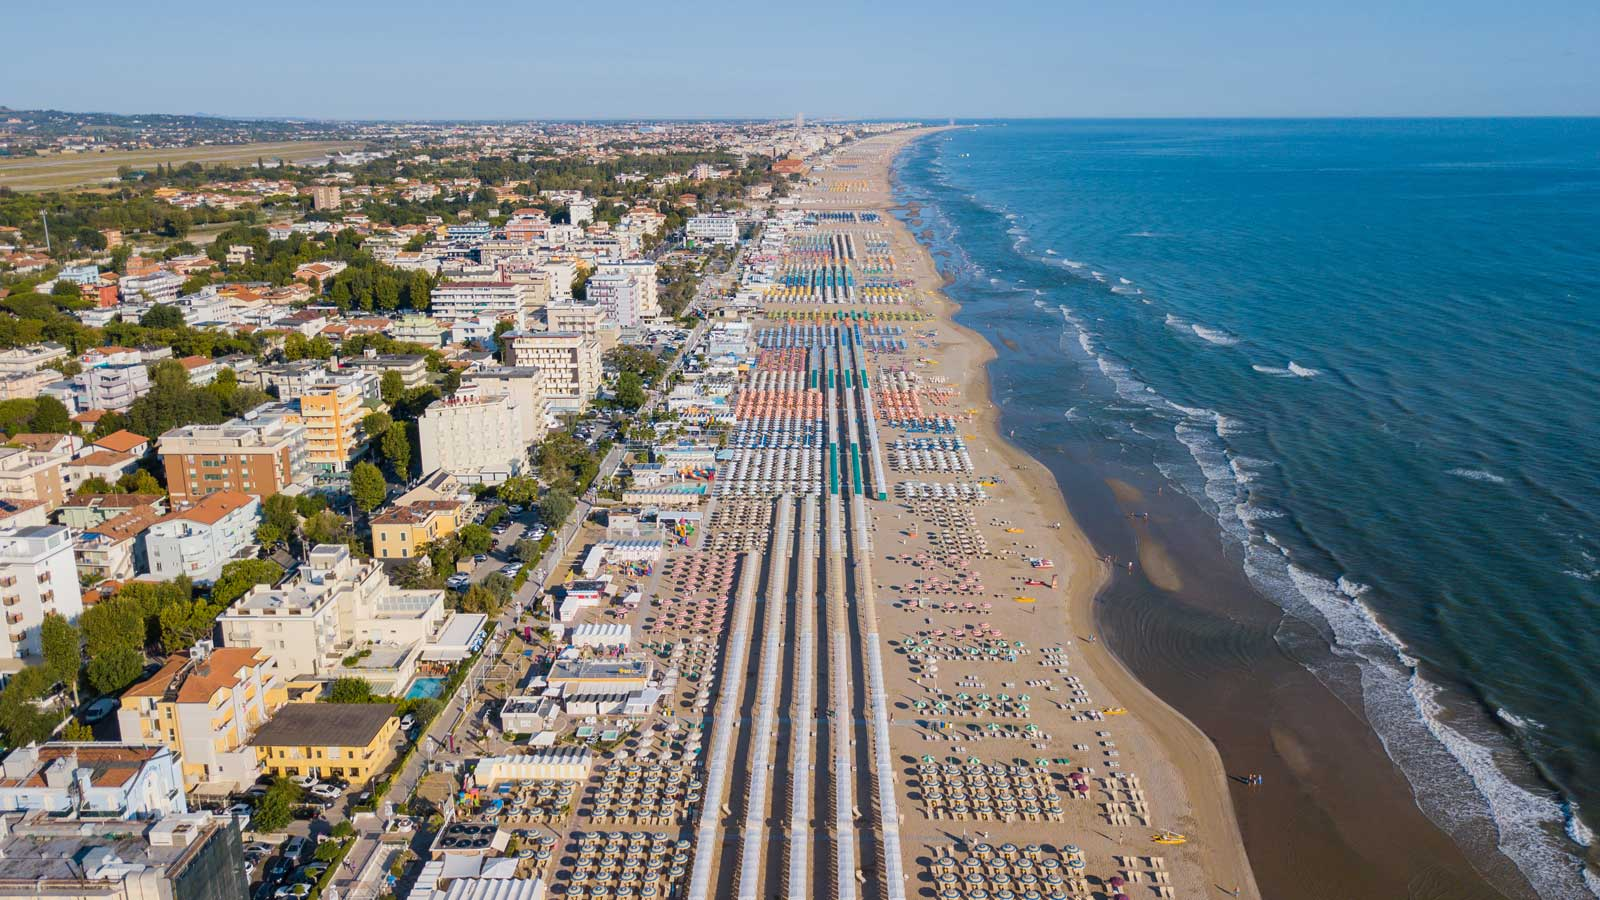 Matrimonio Spiaggia Riviera Romagnola : Spiaggia riccione riviera romagnola spiagge italiane su